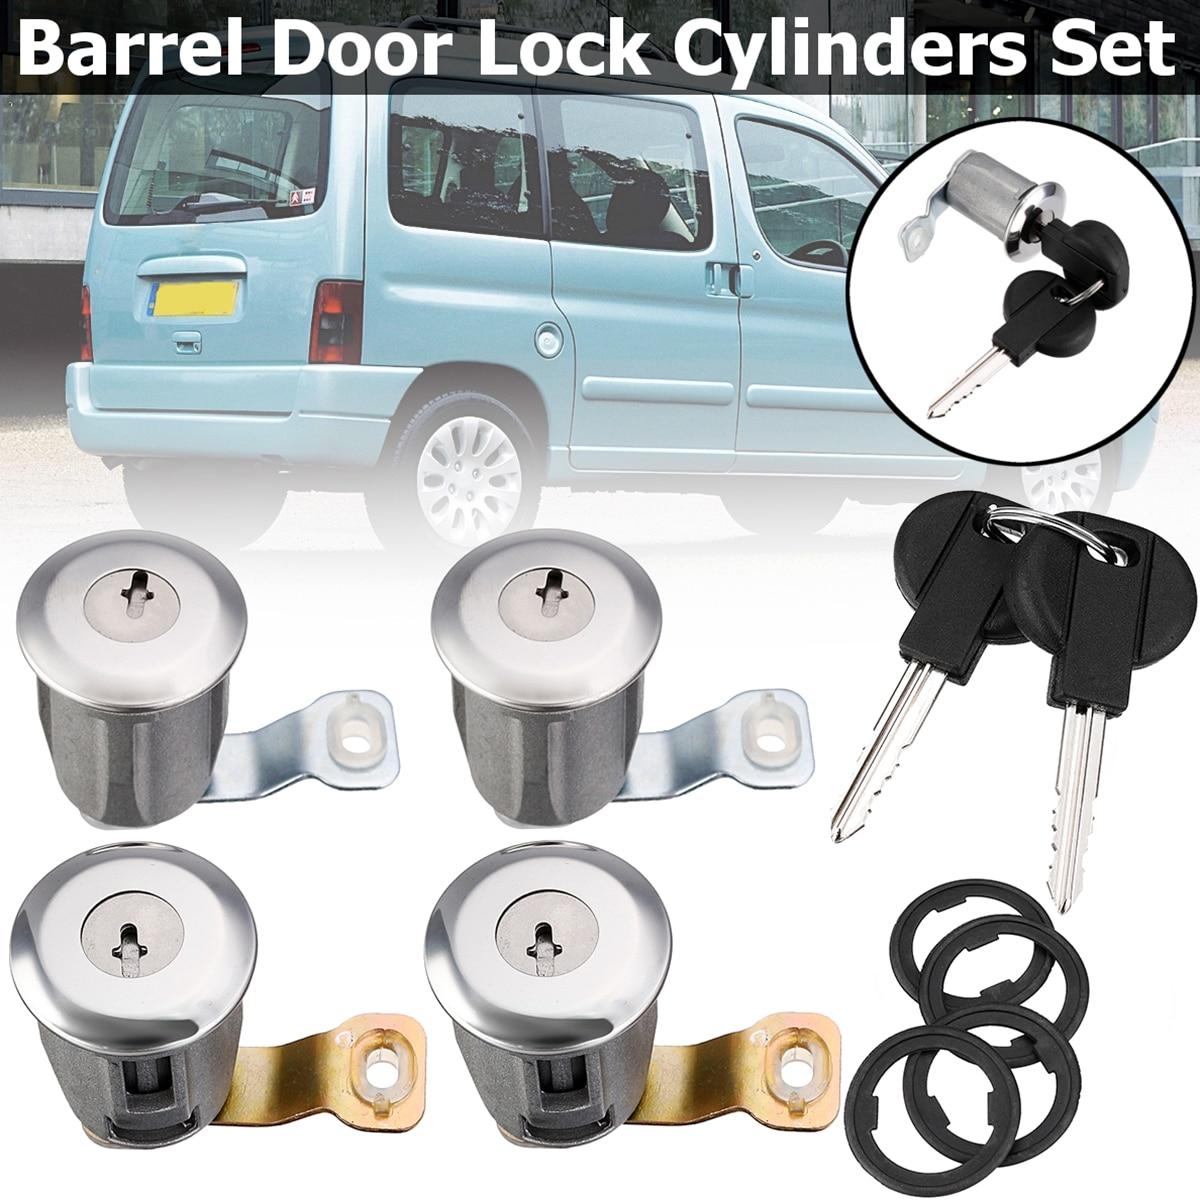 4Pcs Barrel Door Lock Cylinders Two Keys For Peugeot Partner Citr0en Xsara 1996 1997 1998-2007 252522  9170.G3  Locks & Hardware